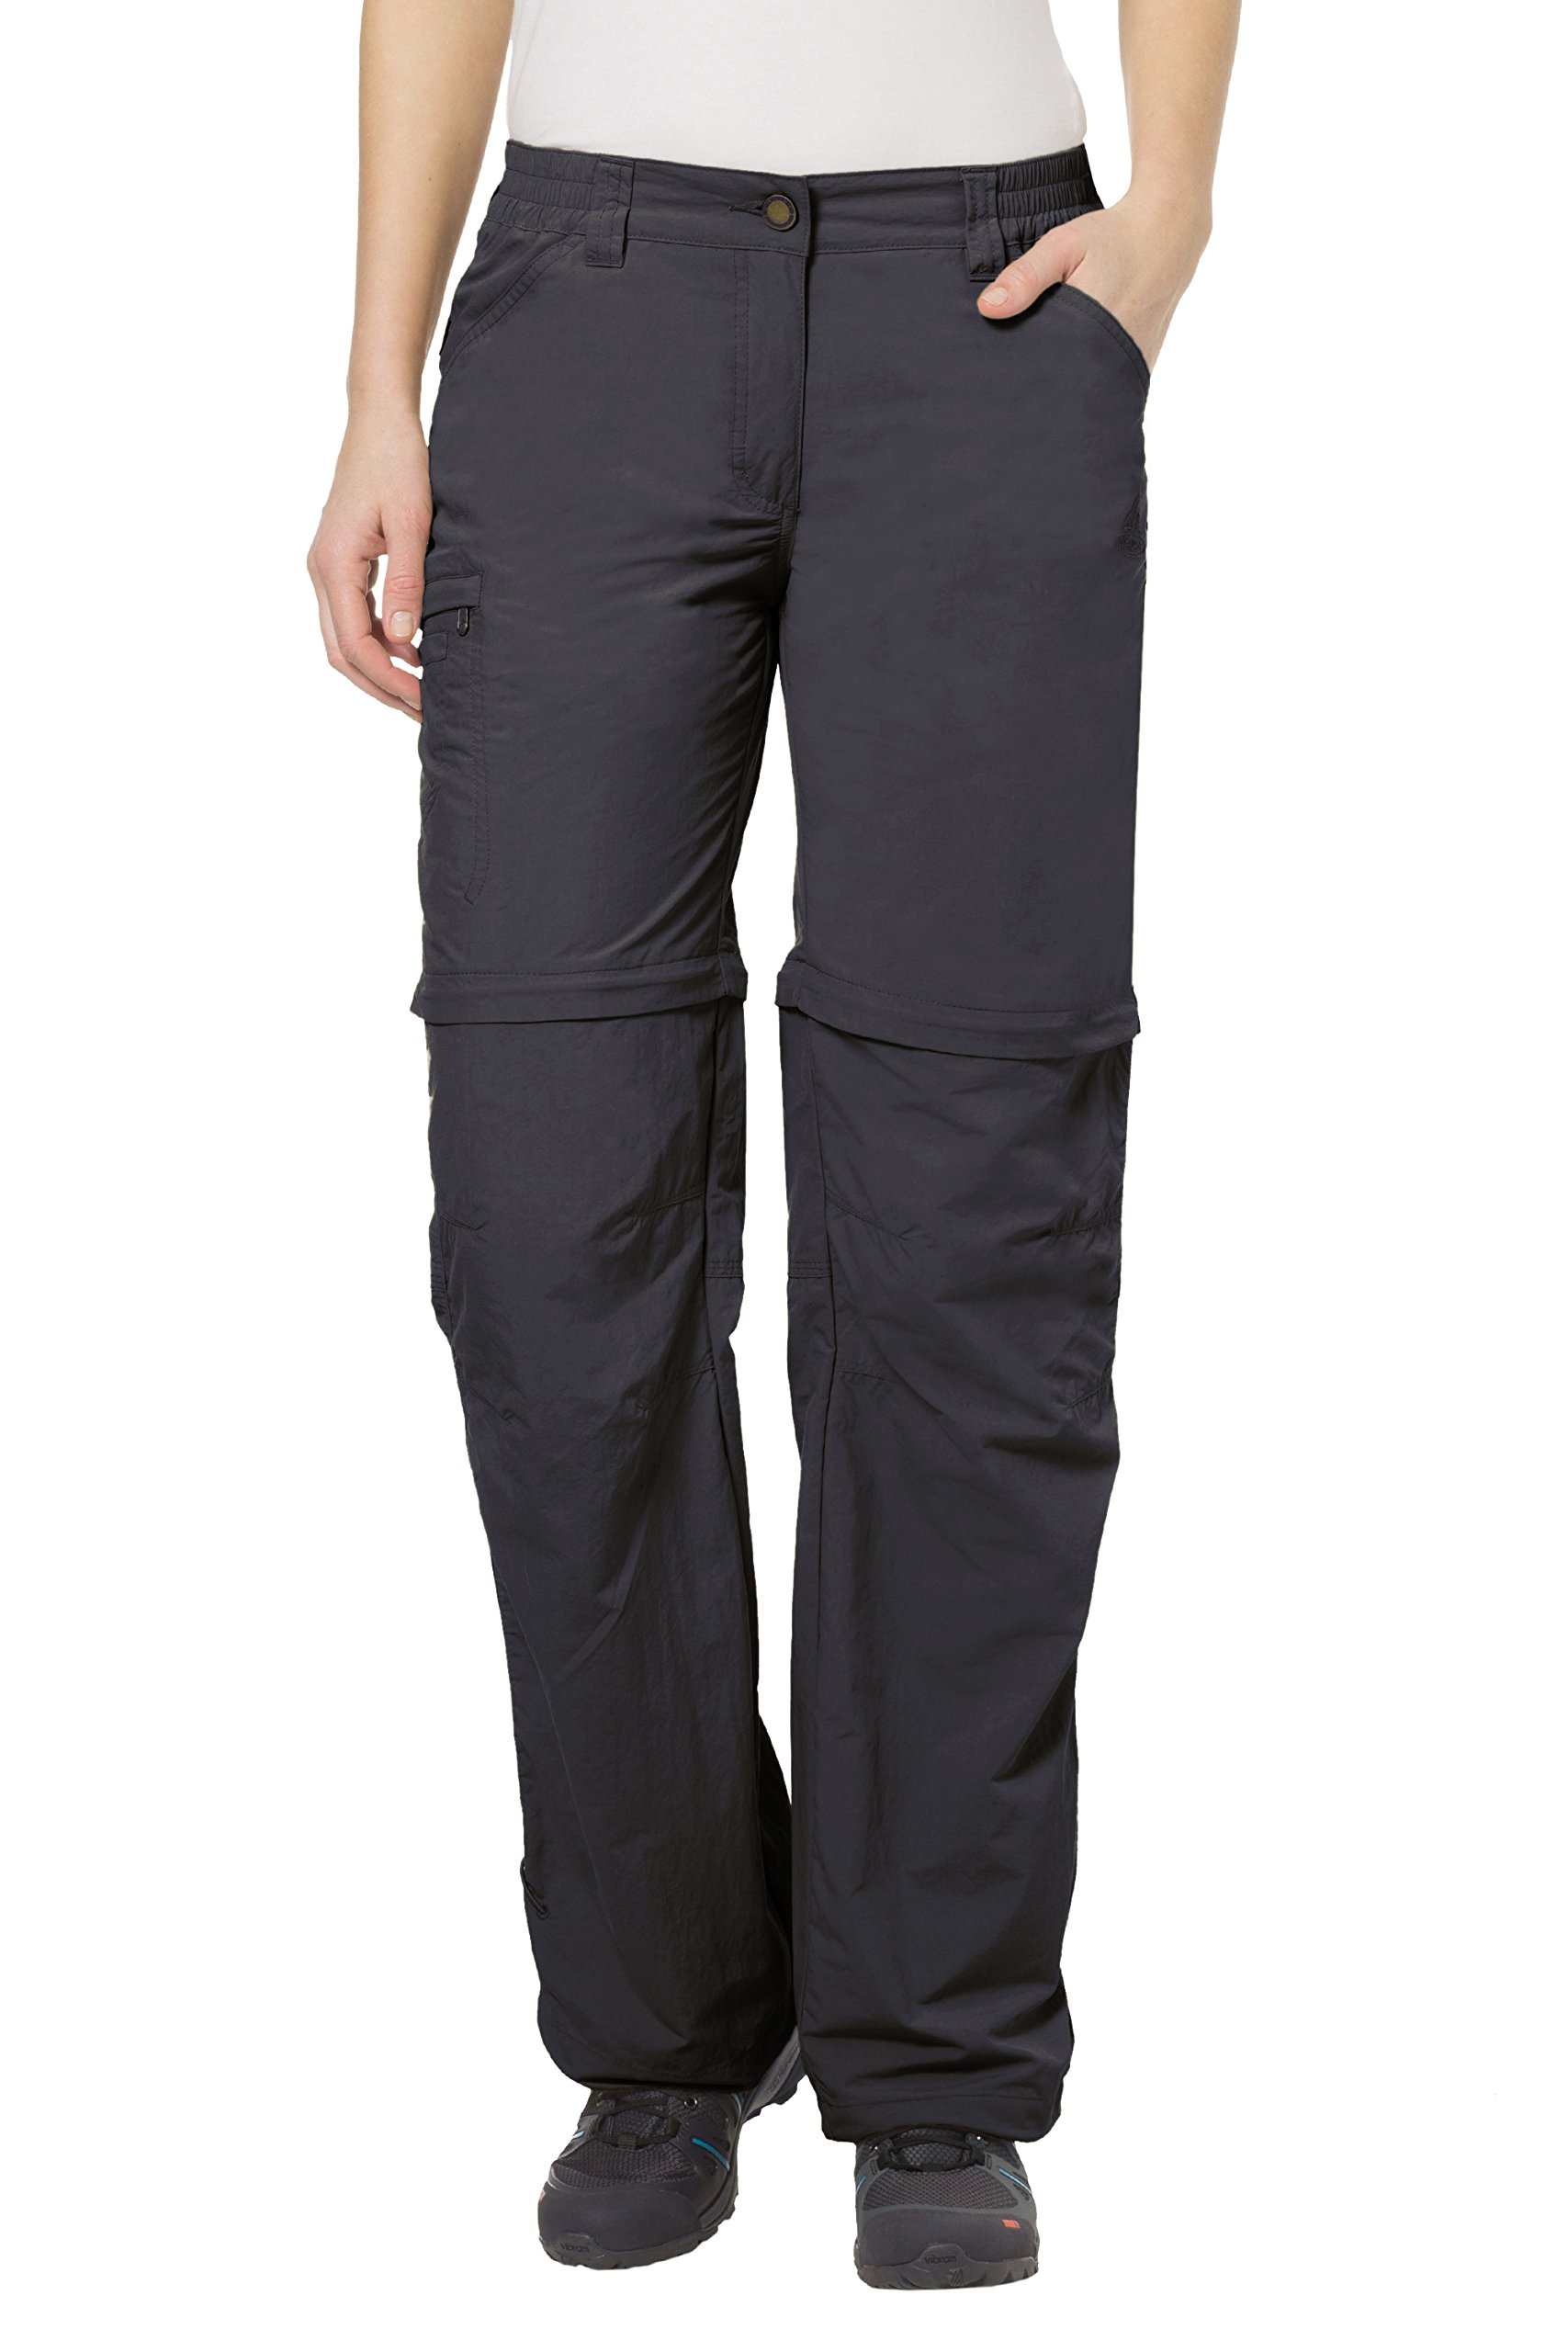 Vaude Damen Hose Women's Farley ZO Pants IV Shorts